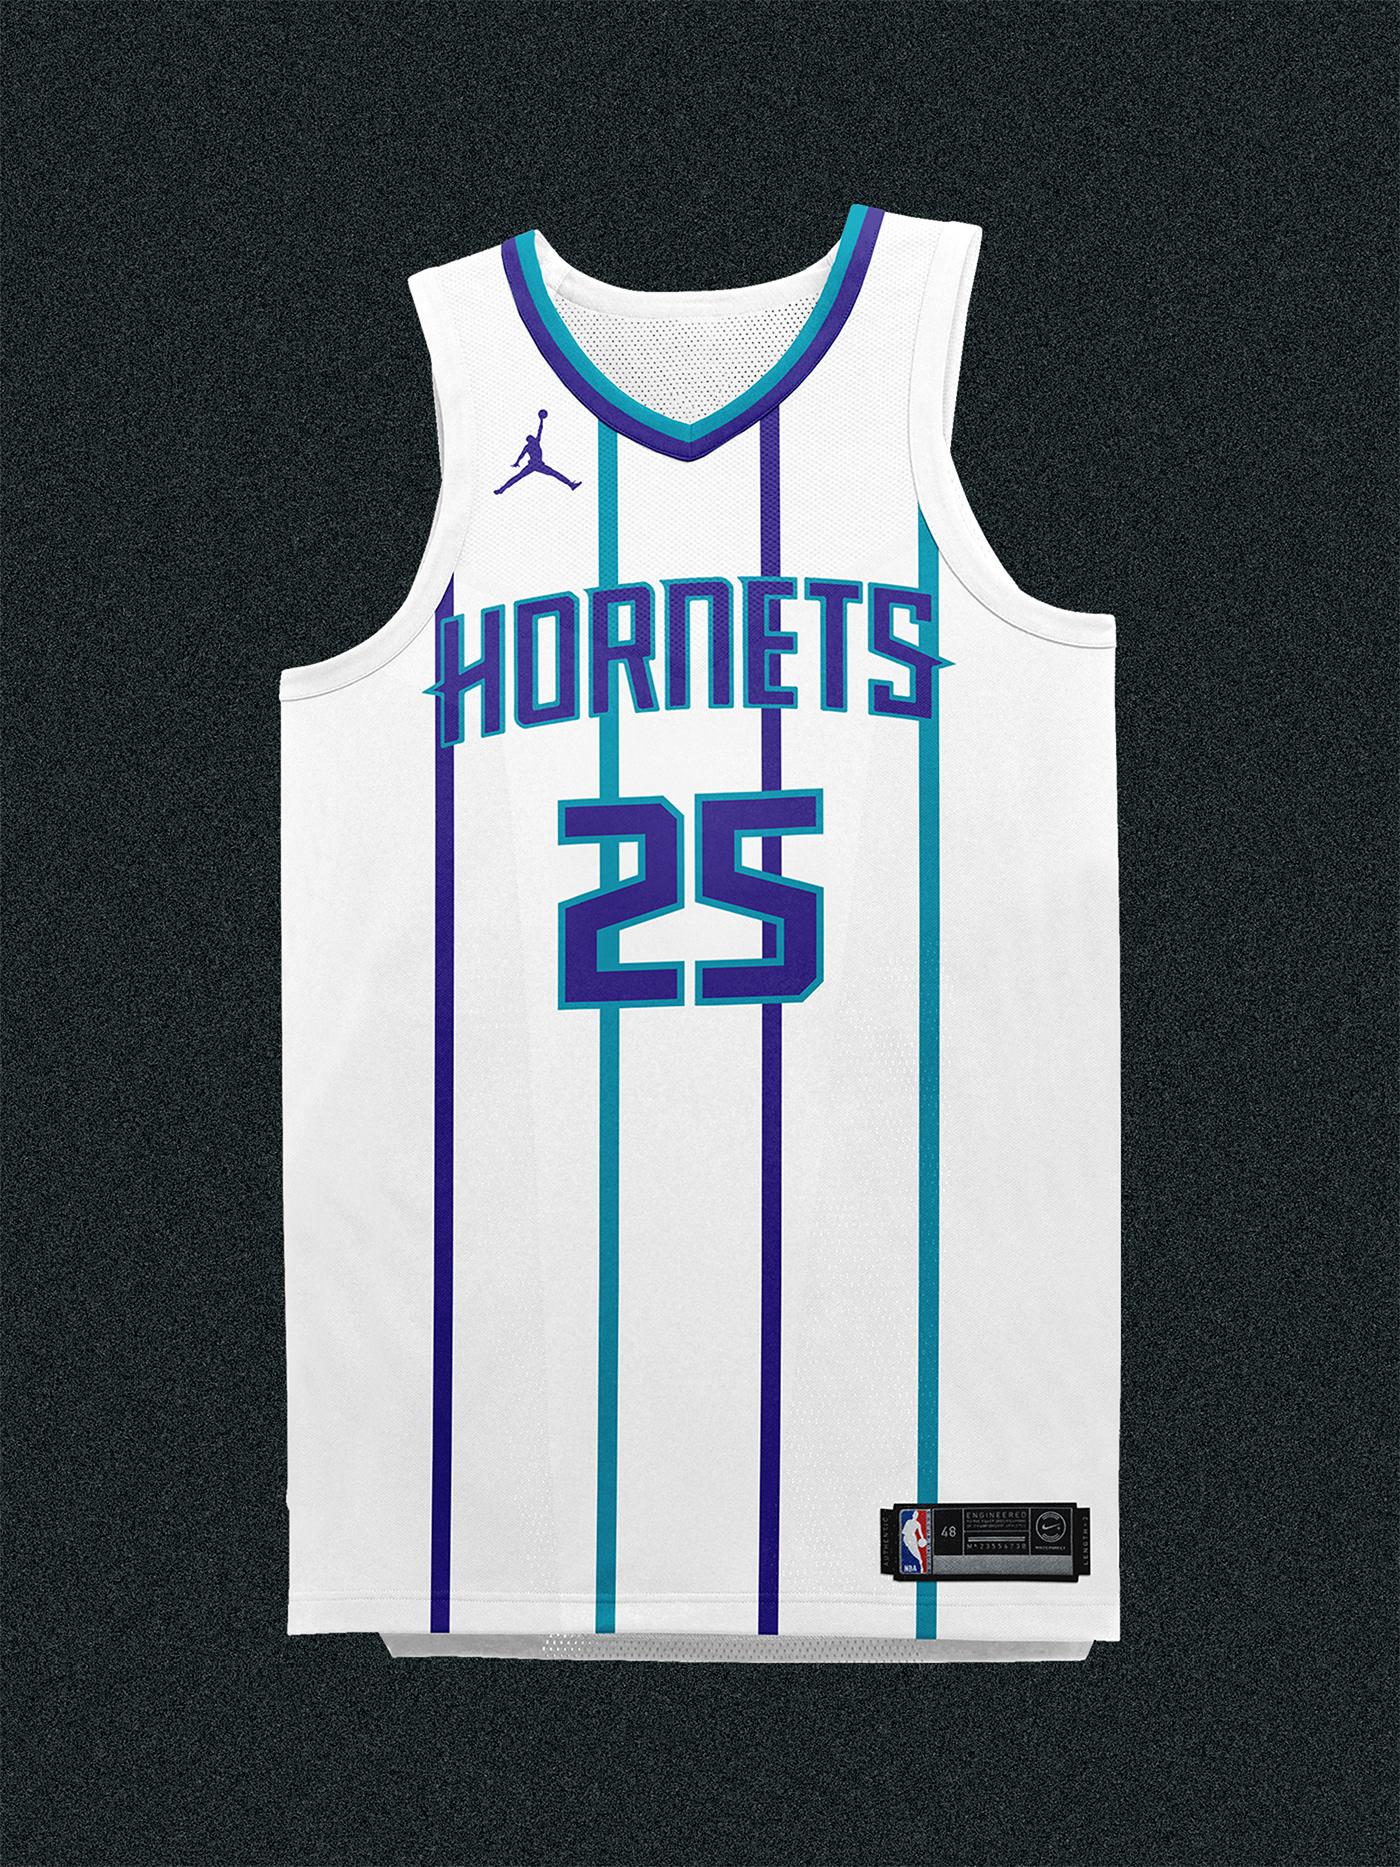 NBA Uniform Refresh on Behance